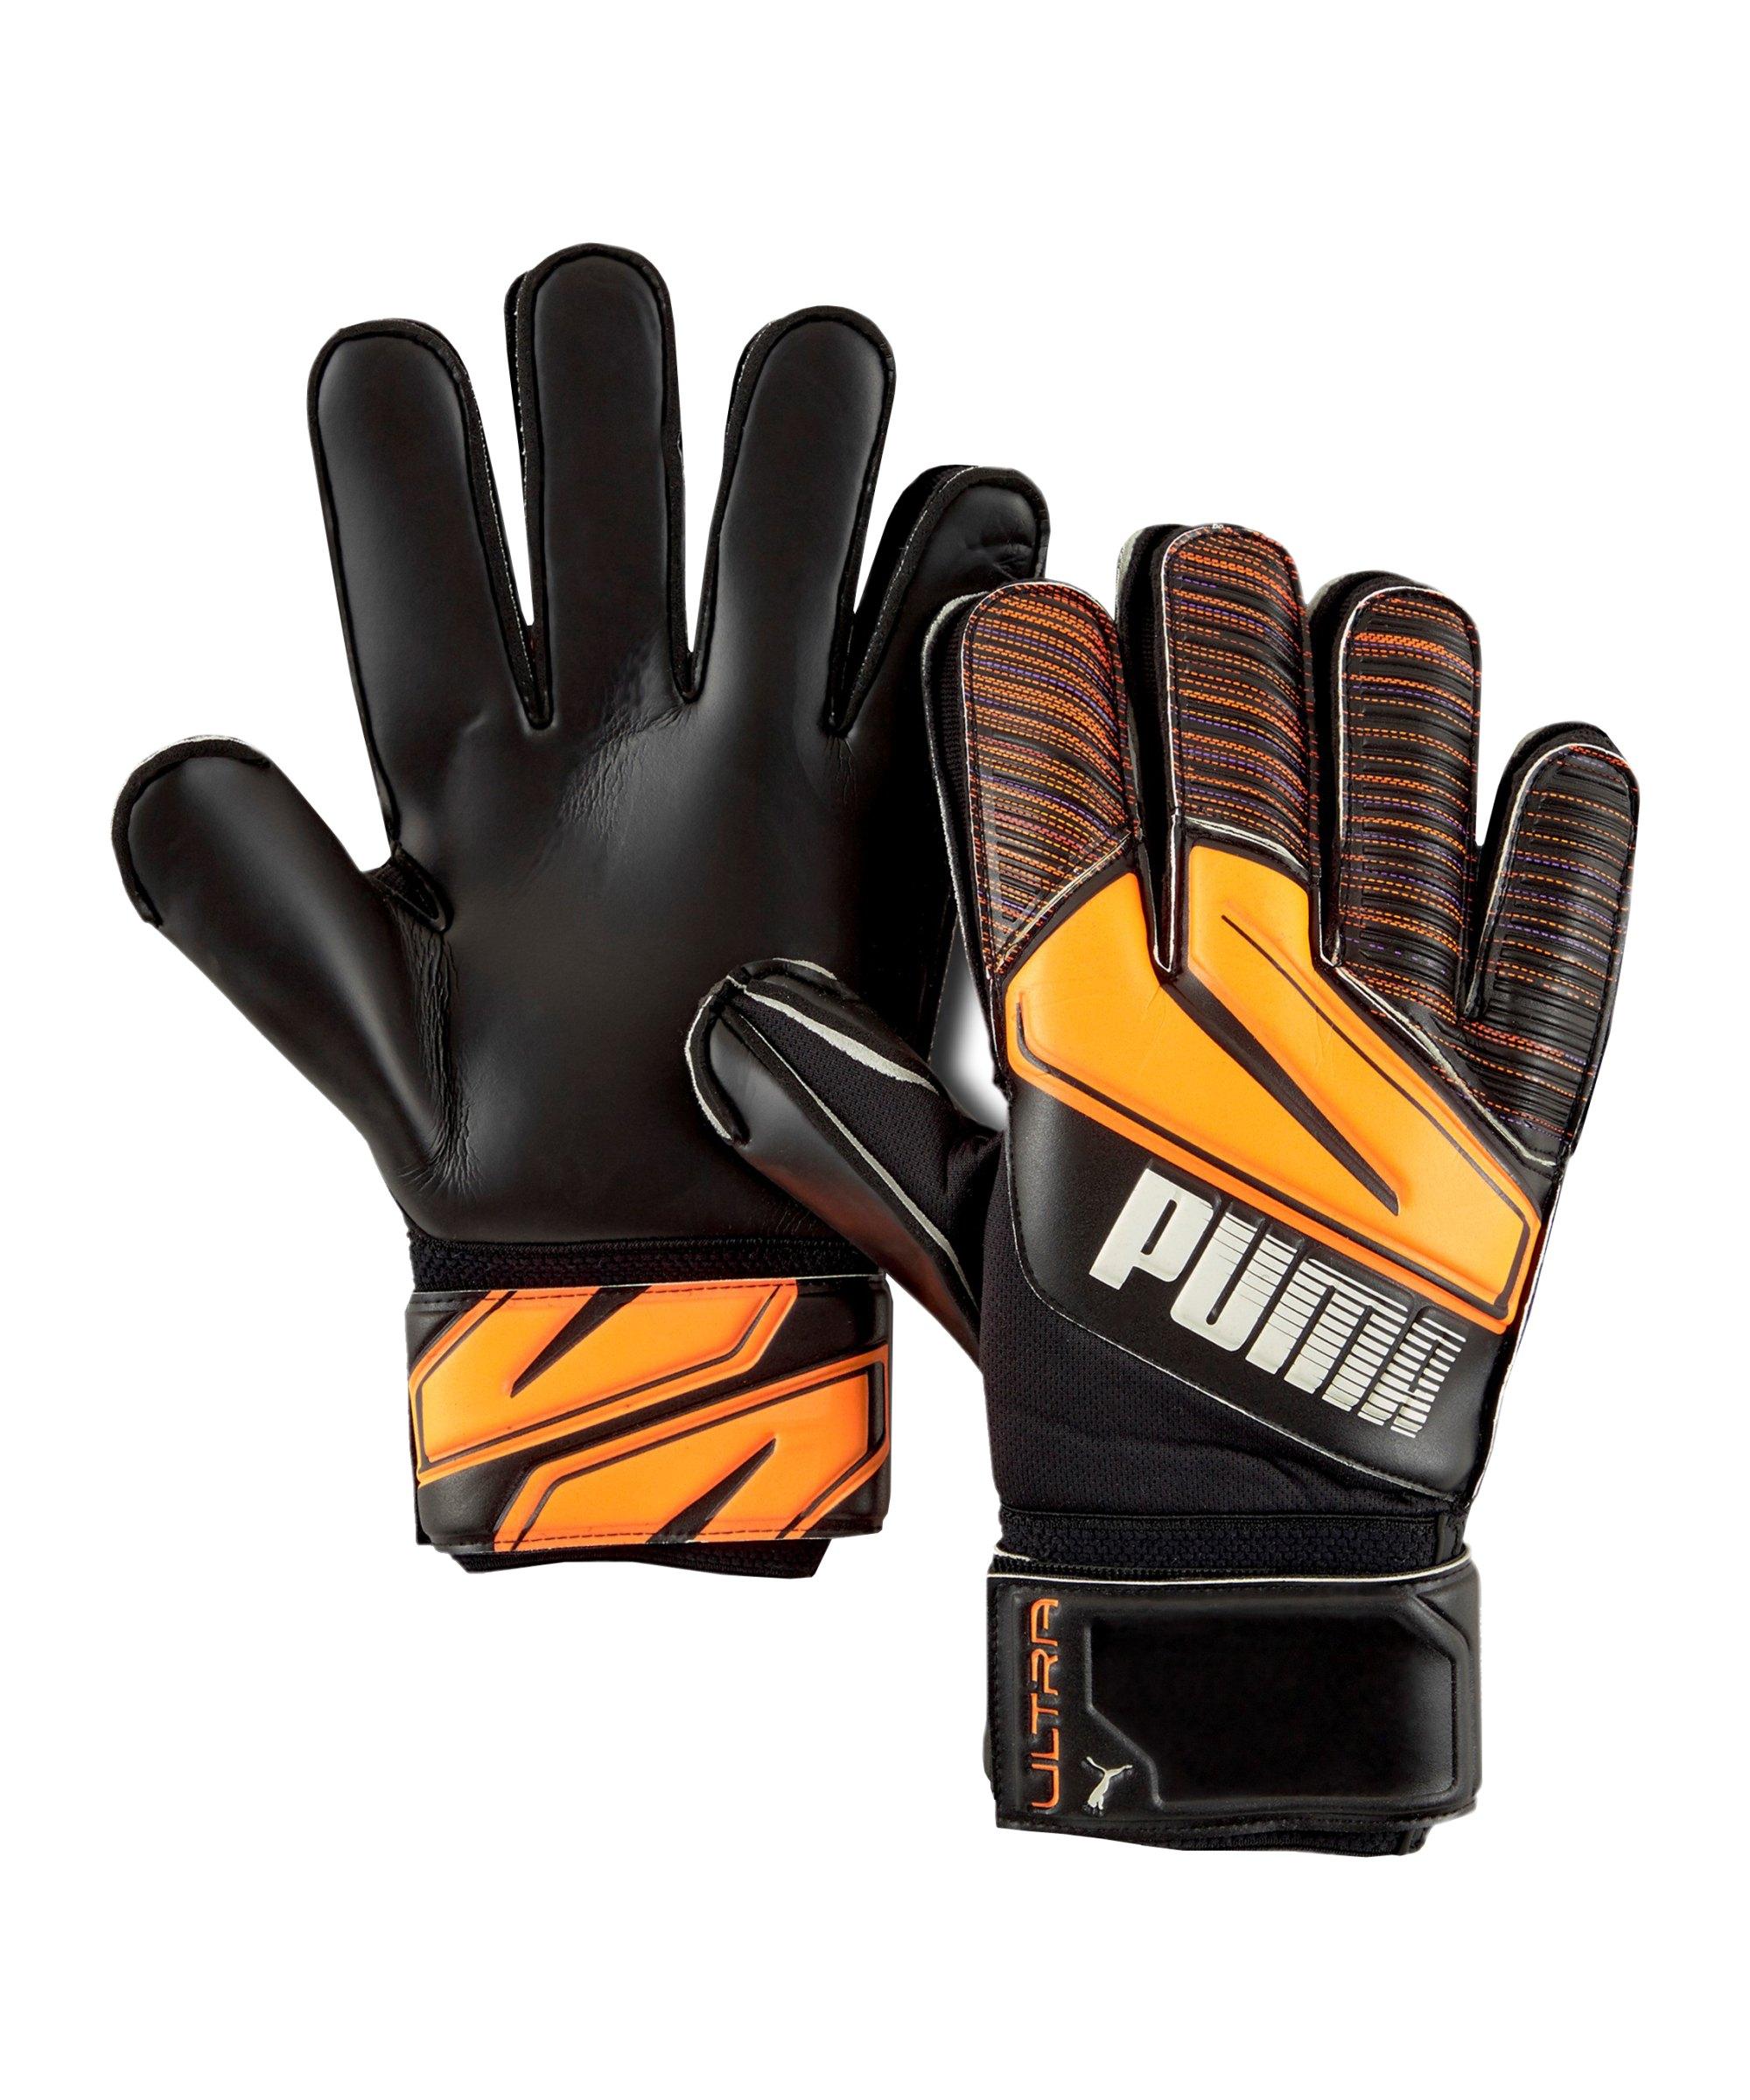 PUMA ULTRA Protect 2 RC Torwarthandschuh F01 - orange